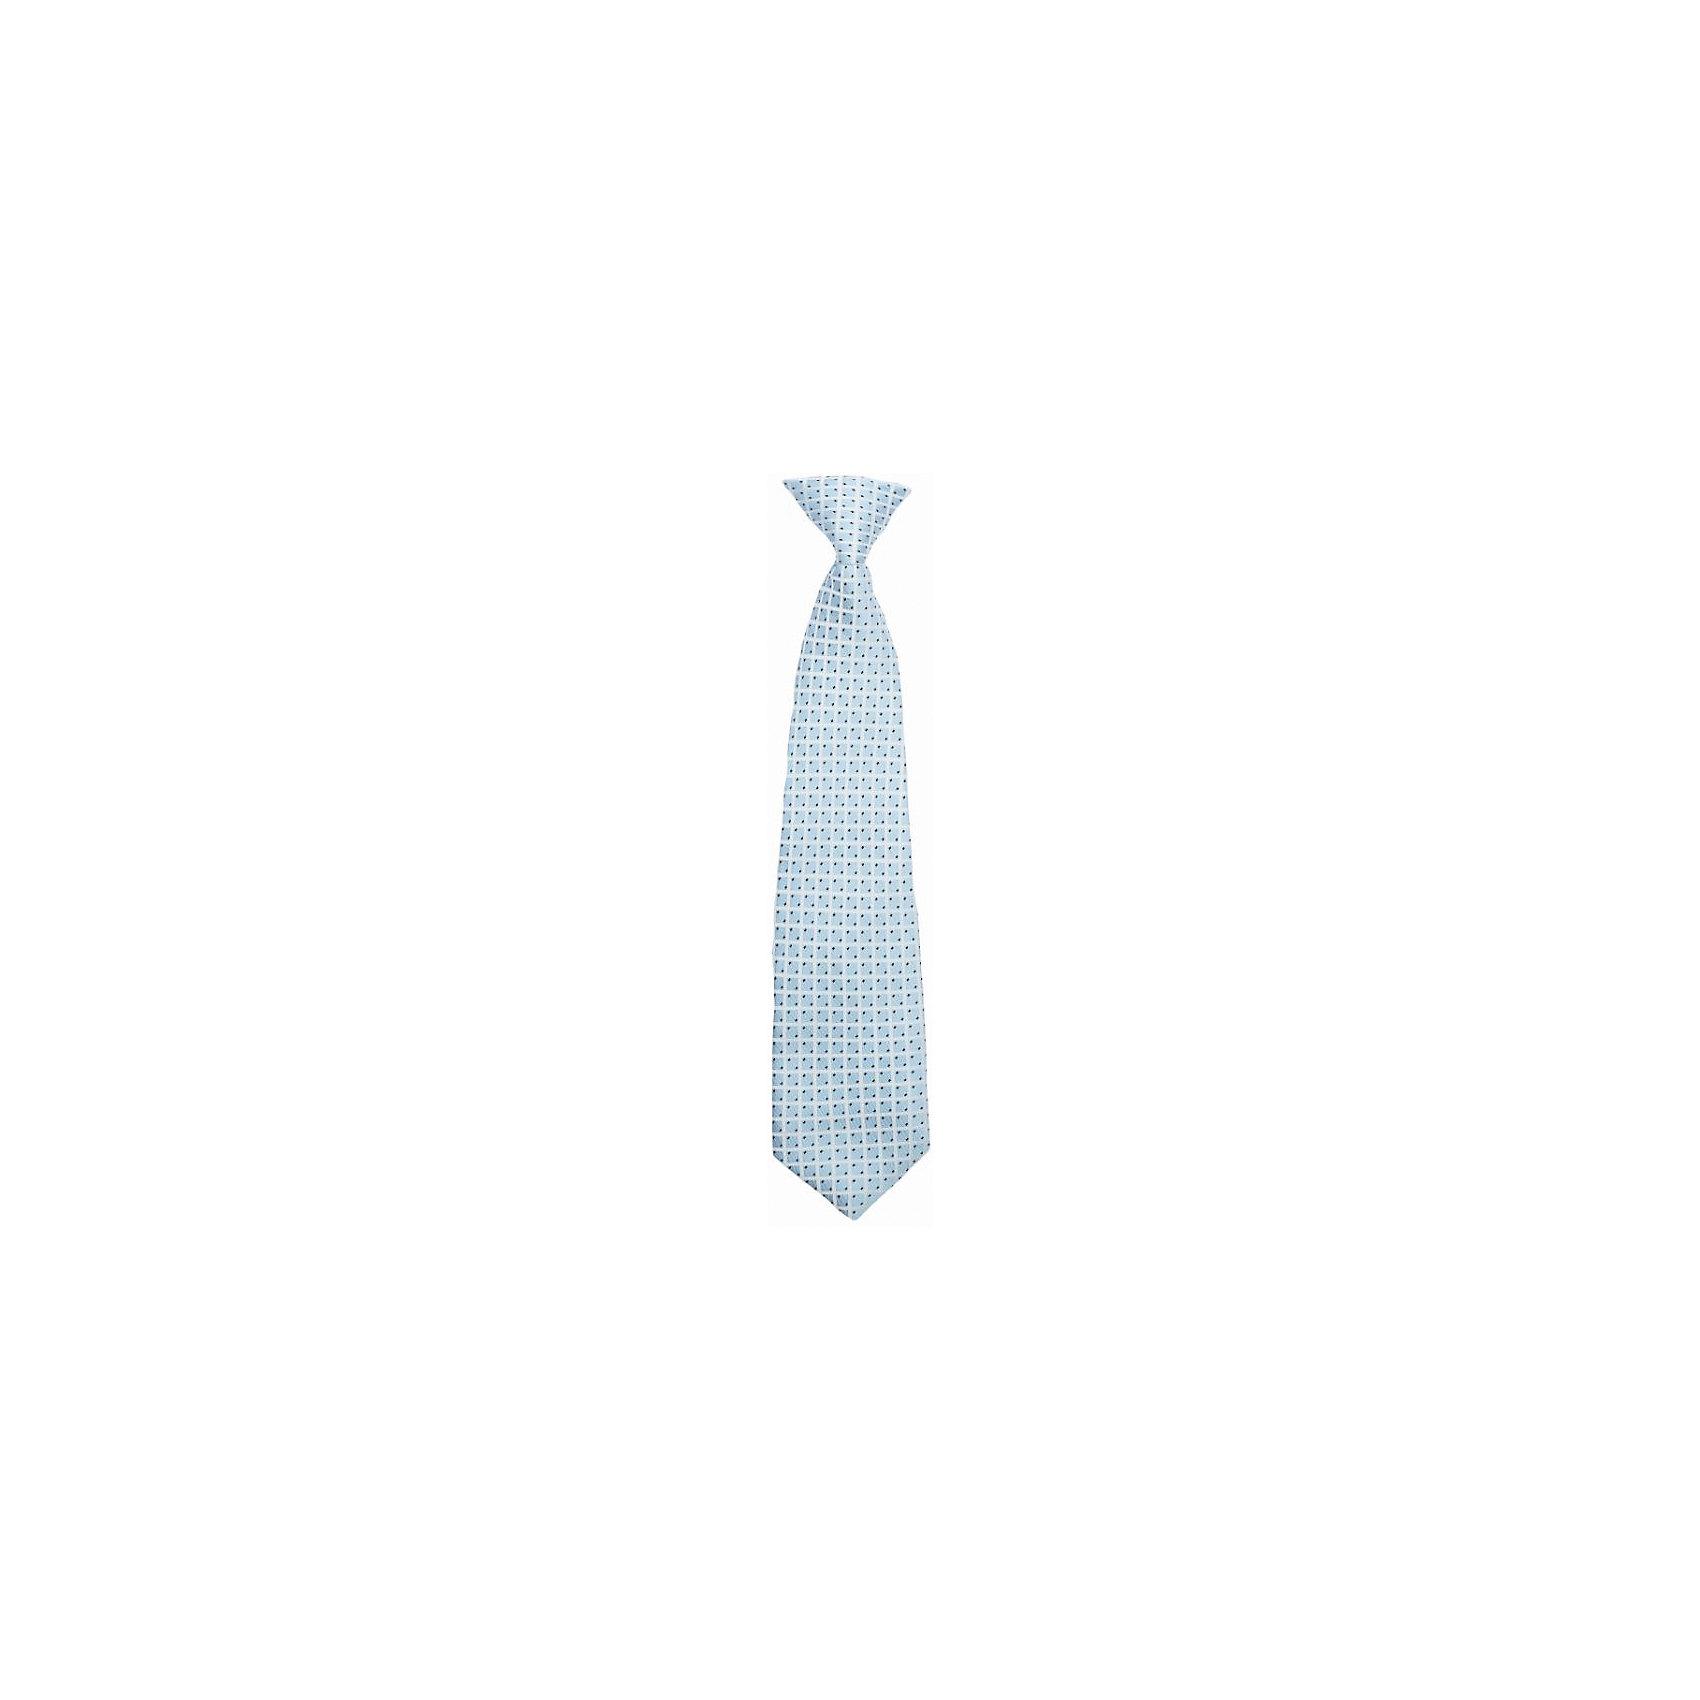 S'cool Галстук для мальчика S'cool галстук бабочка для мальчика 18628 050 синий noble people